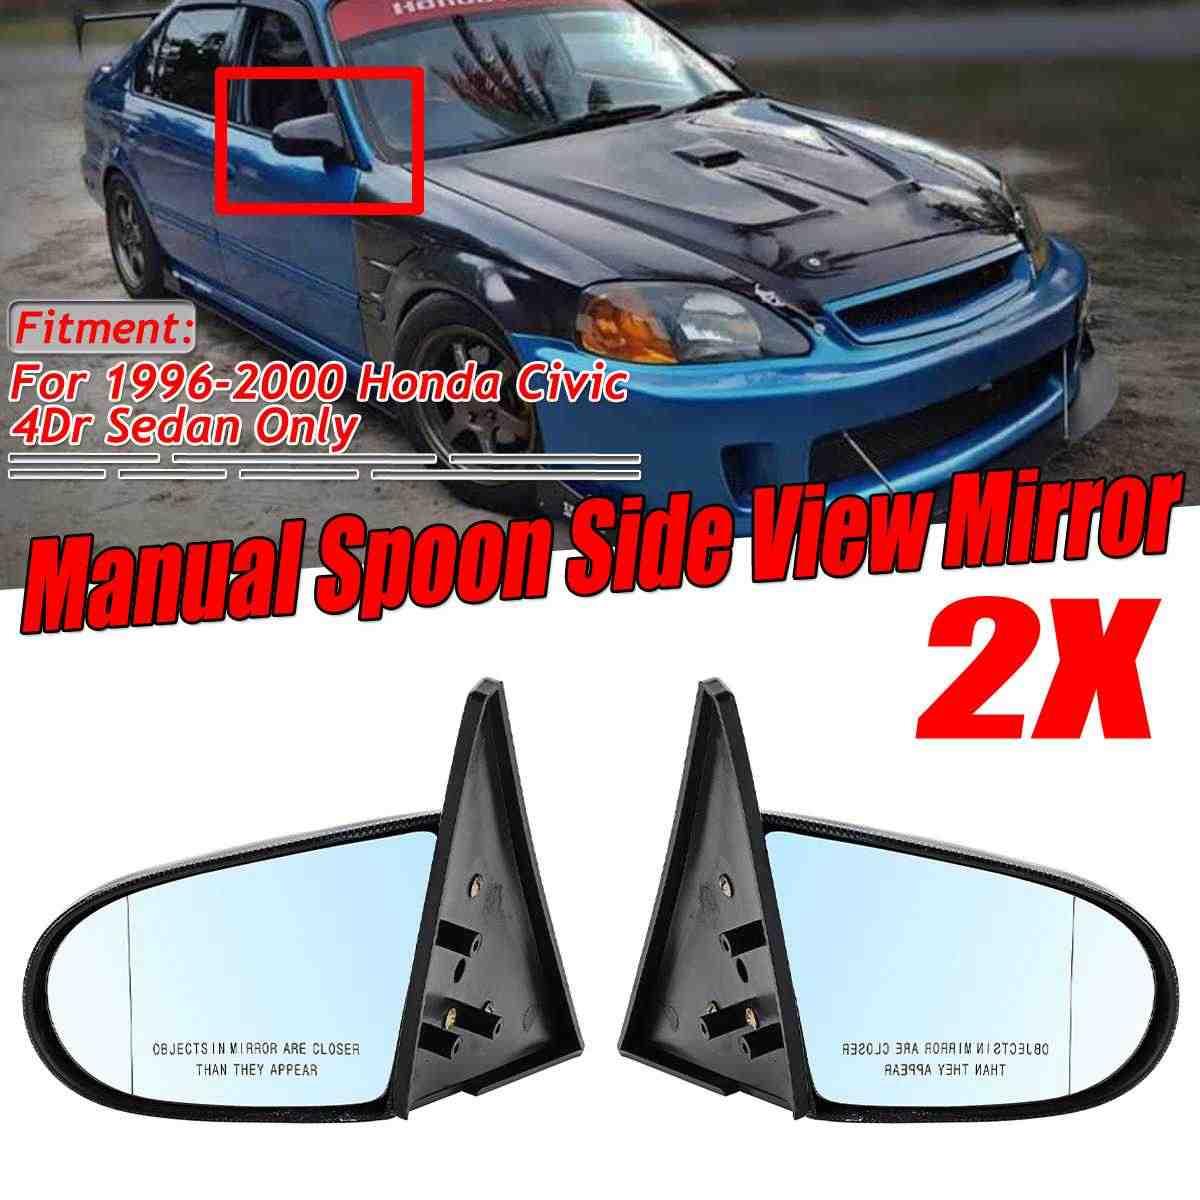 Espejo Retrovisor Con Apariencia De Fibra De Carbono Para Honda Civic Ek 4dr Sedan 2x Espejo Lateral Ajustable Manual 2x Espejo Y Coberturas Aliexpress